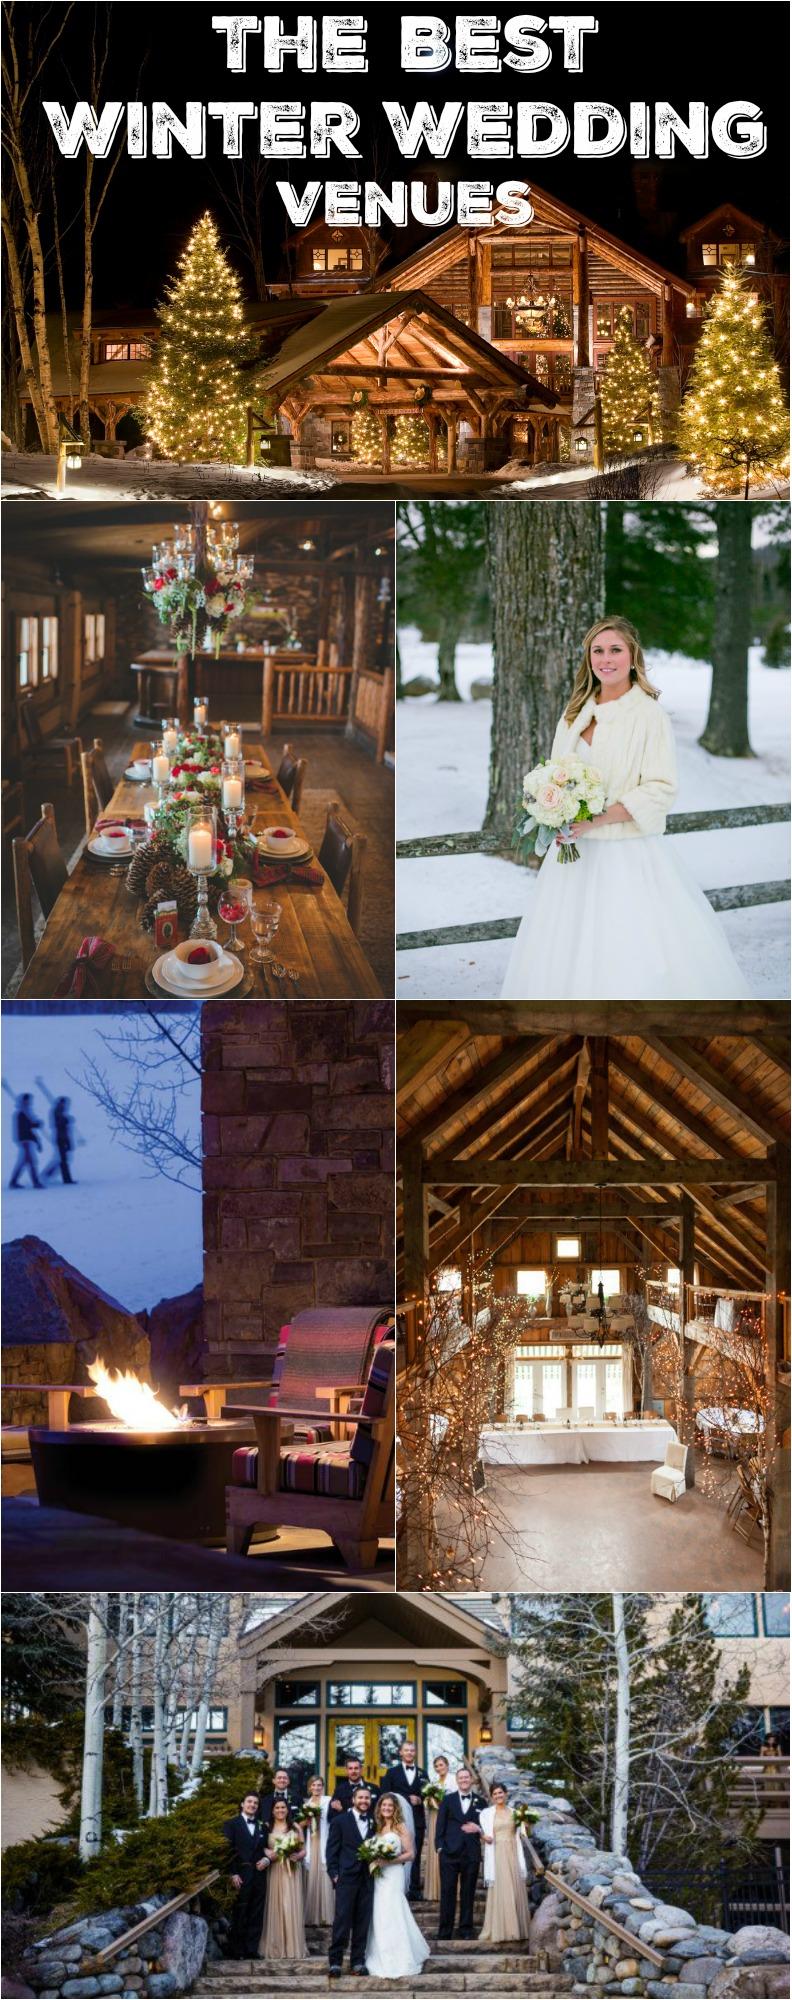 10 Must-See Winter Wedding Venues - Rustic Wedding Chic